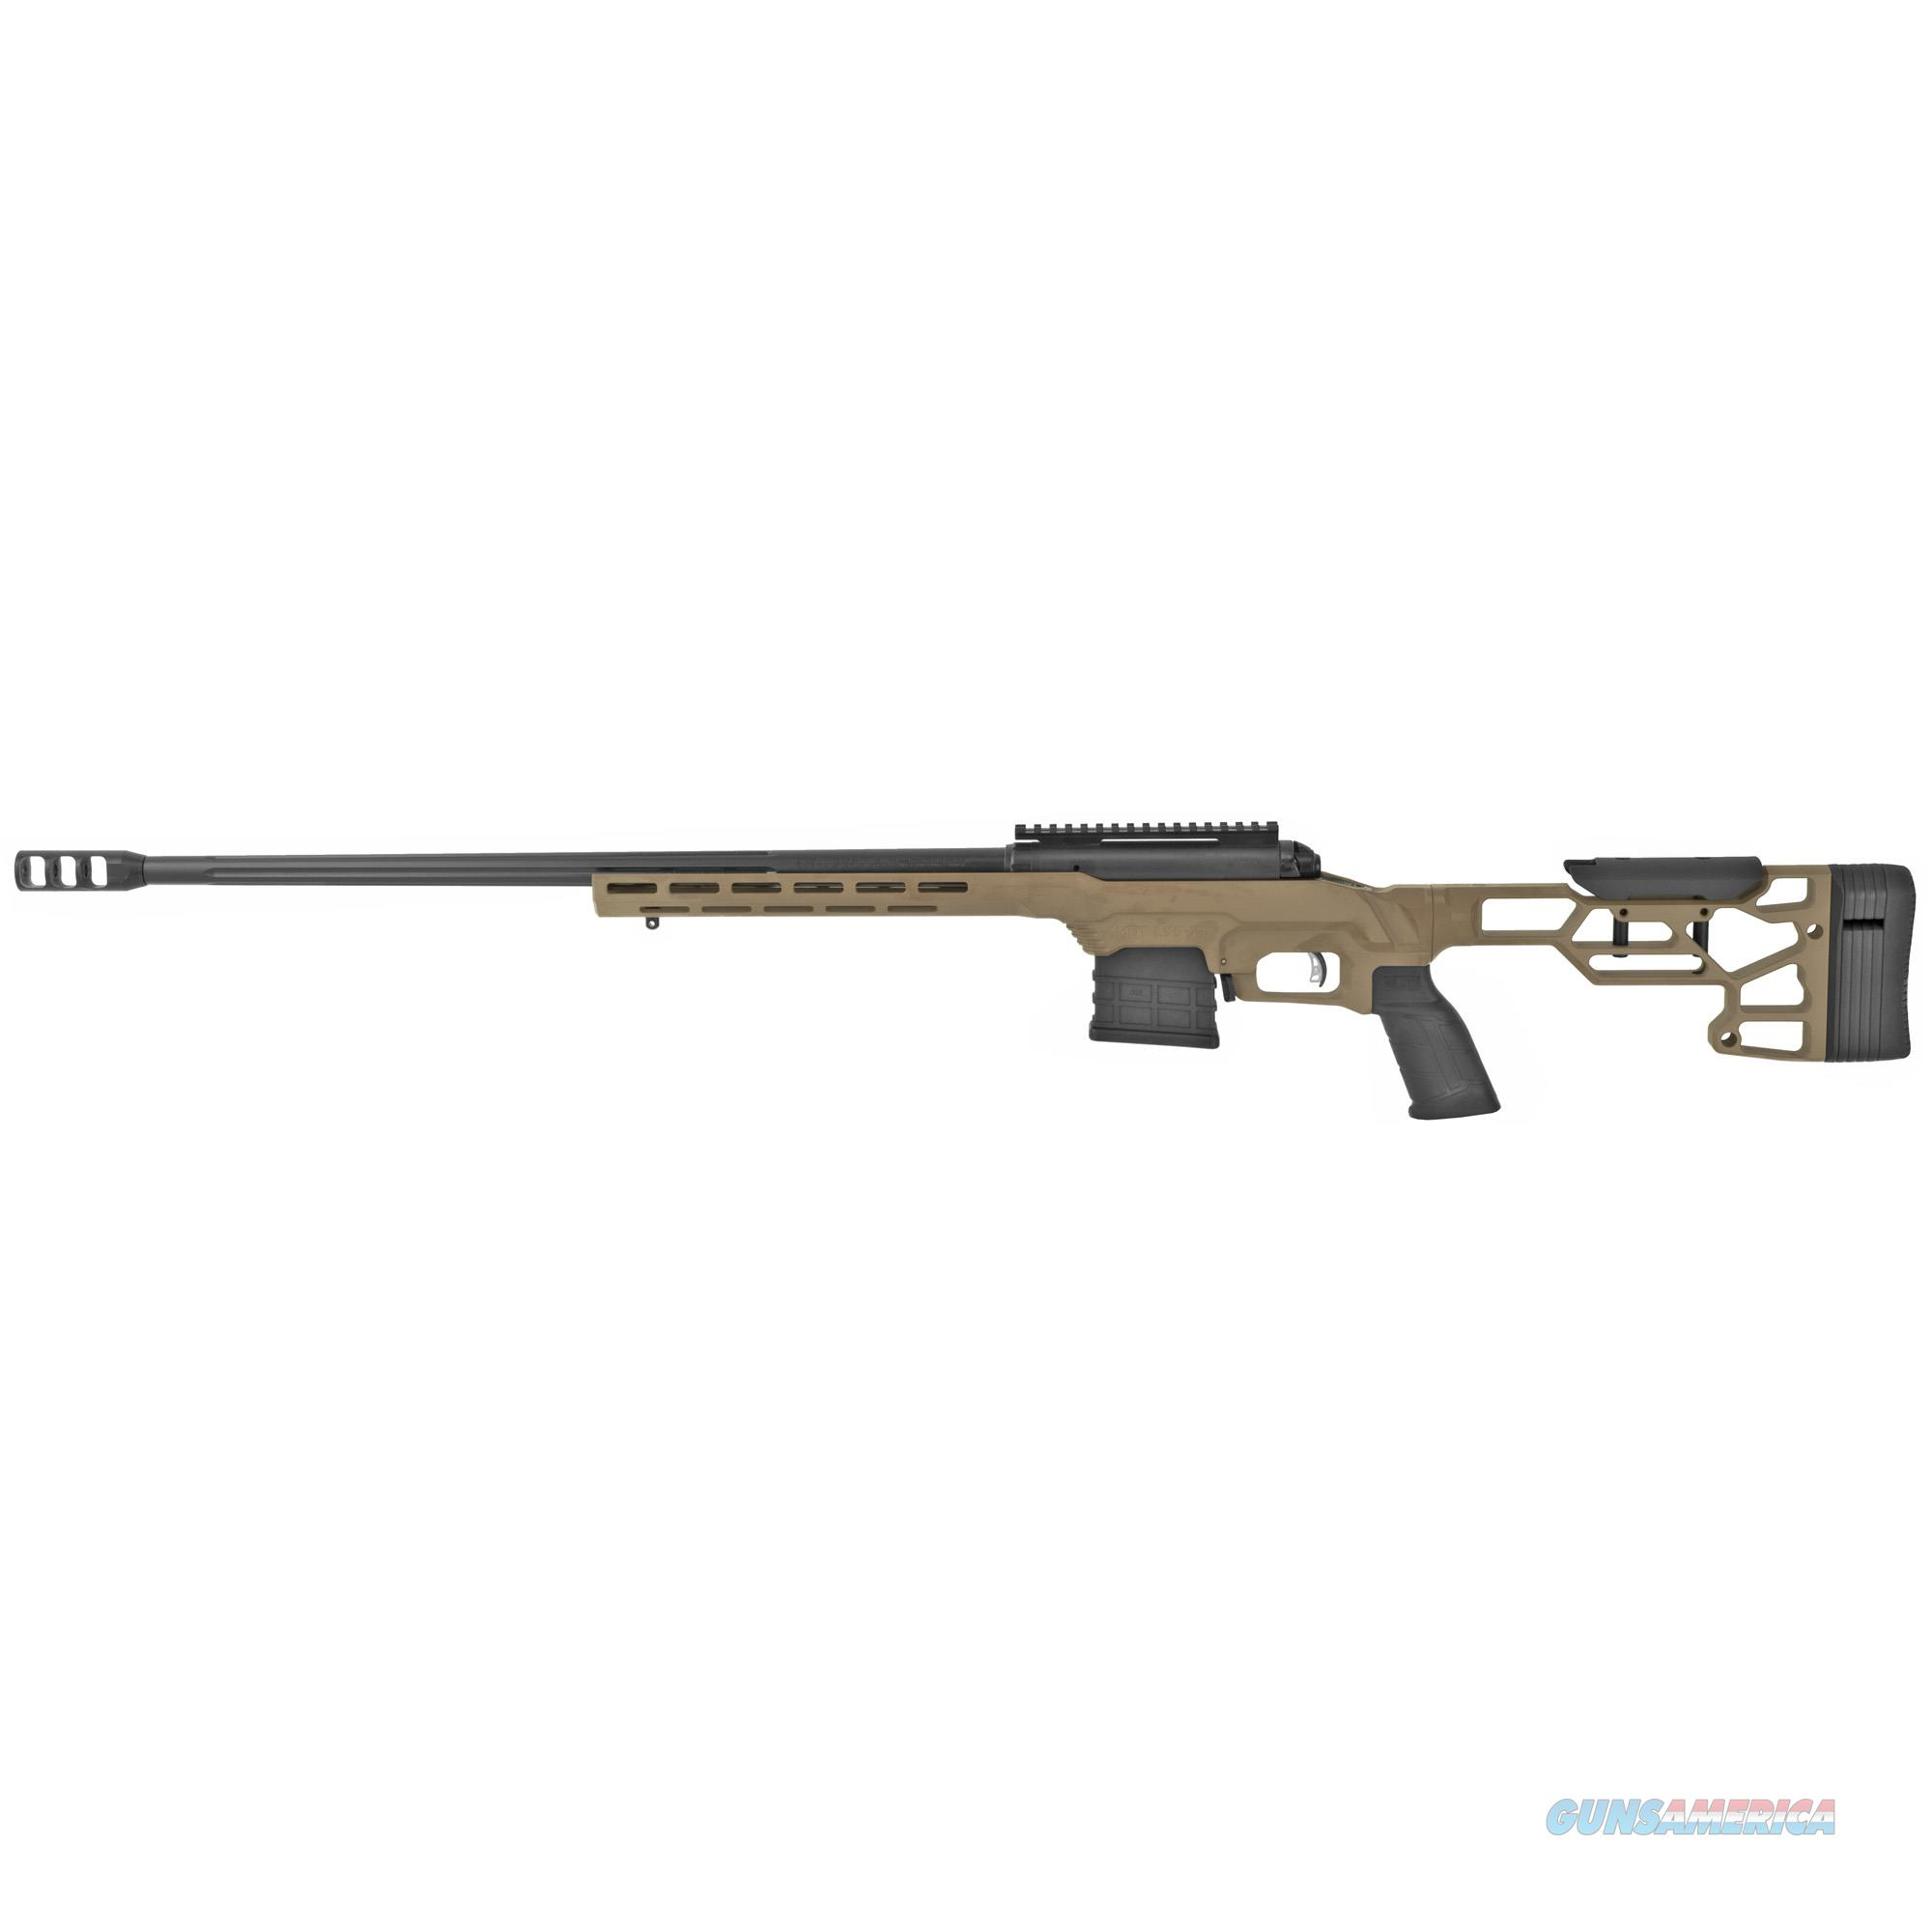 Savage 10-110, Sav 57564 110 Precision 6.5 Crd  Guns > Pistols > 1911 Pistol Copies (non-Colt)